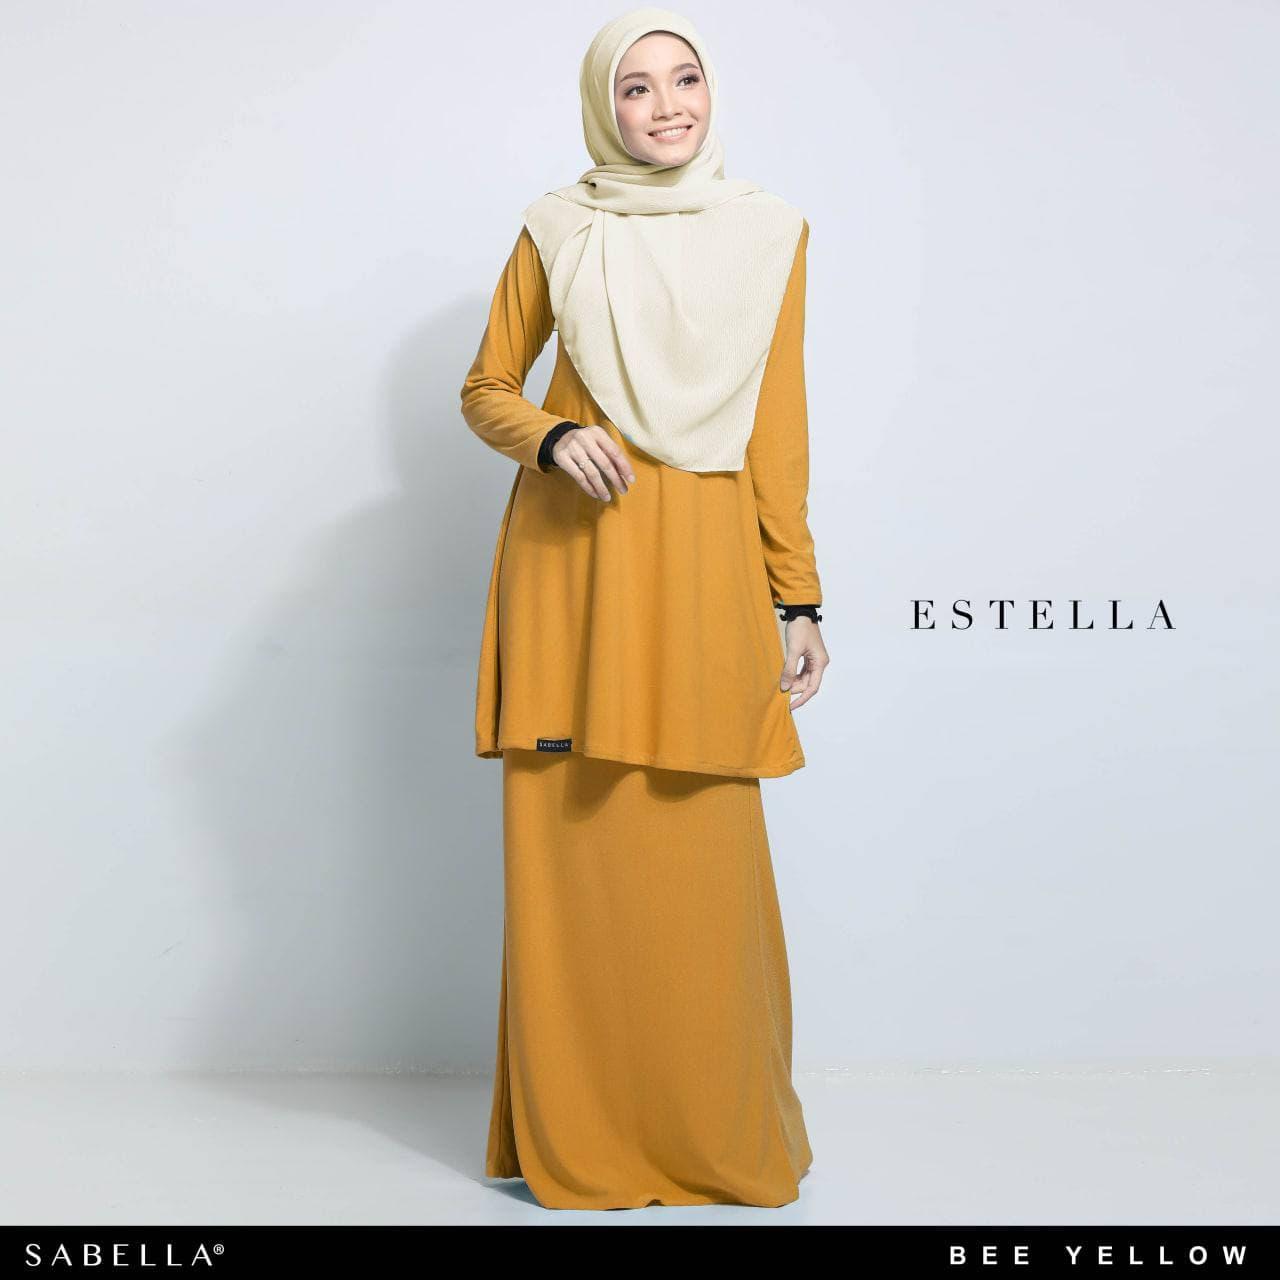 Estella 2.0 Bee Yellow (R)